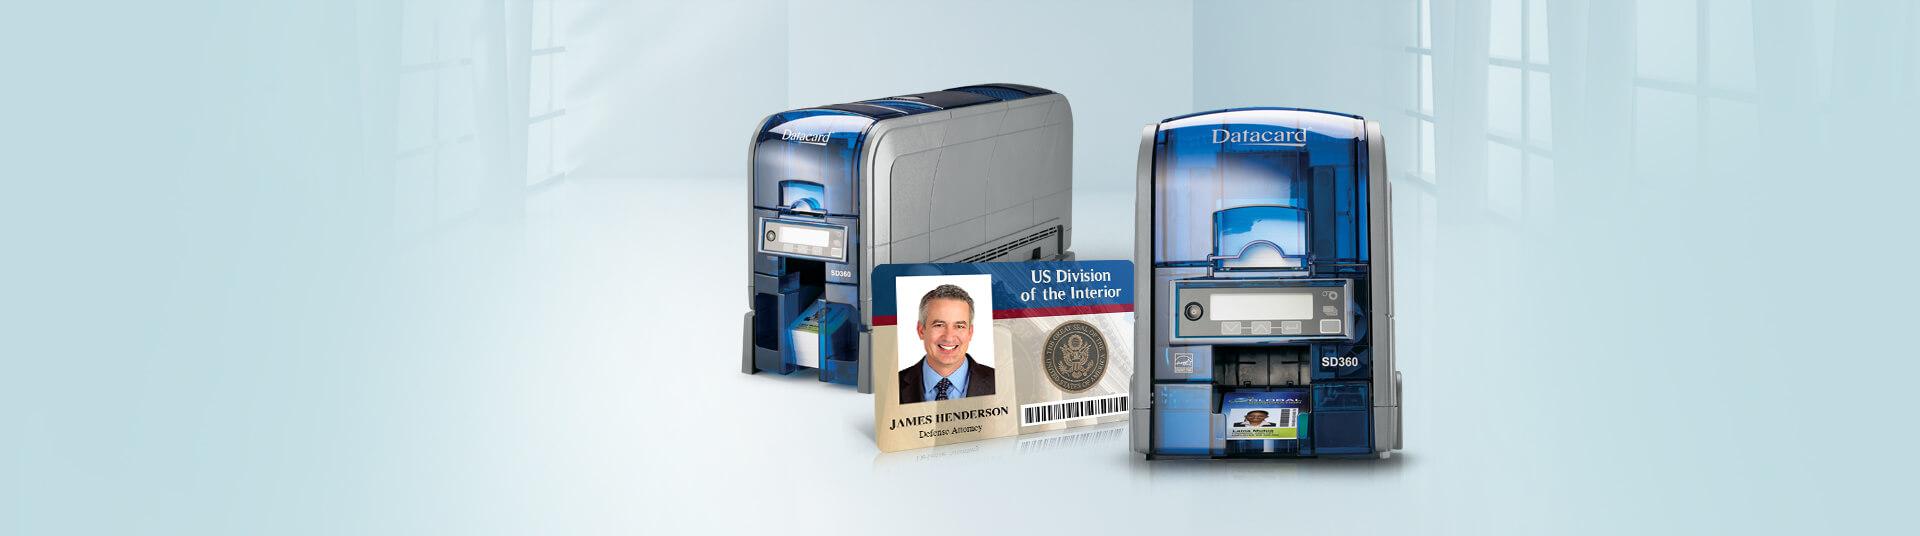 Datacard SD360 ID Card Printers